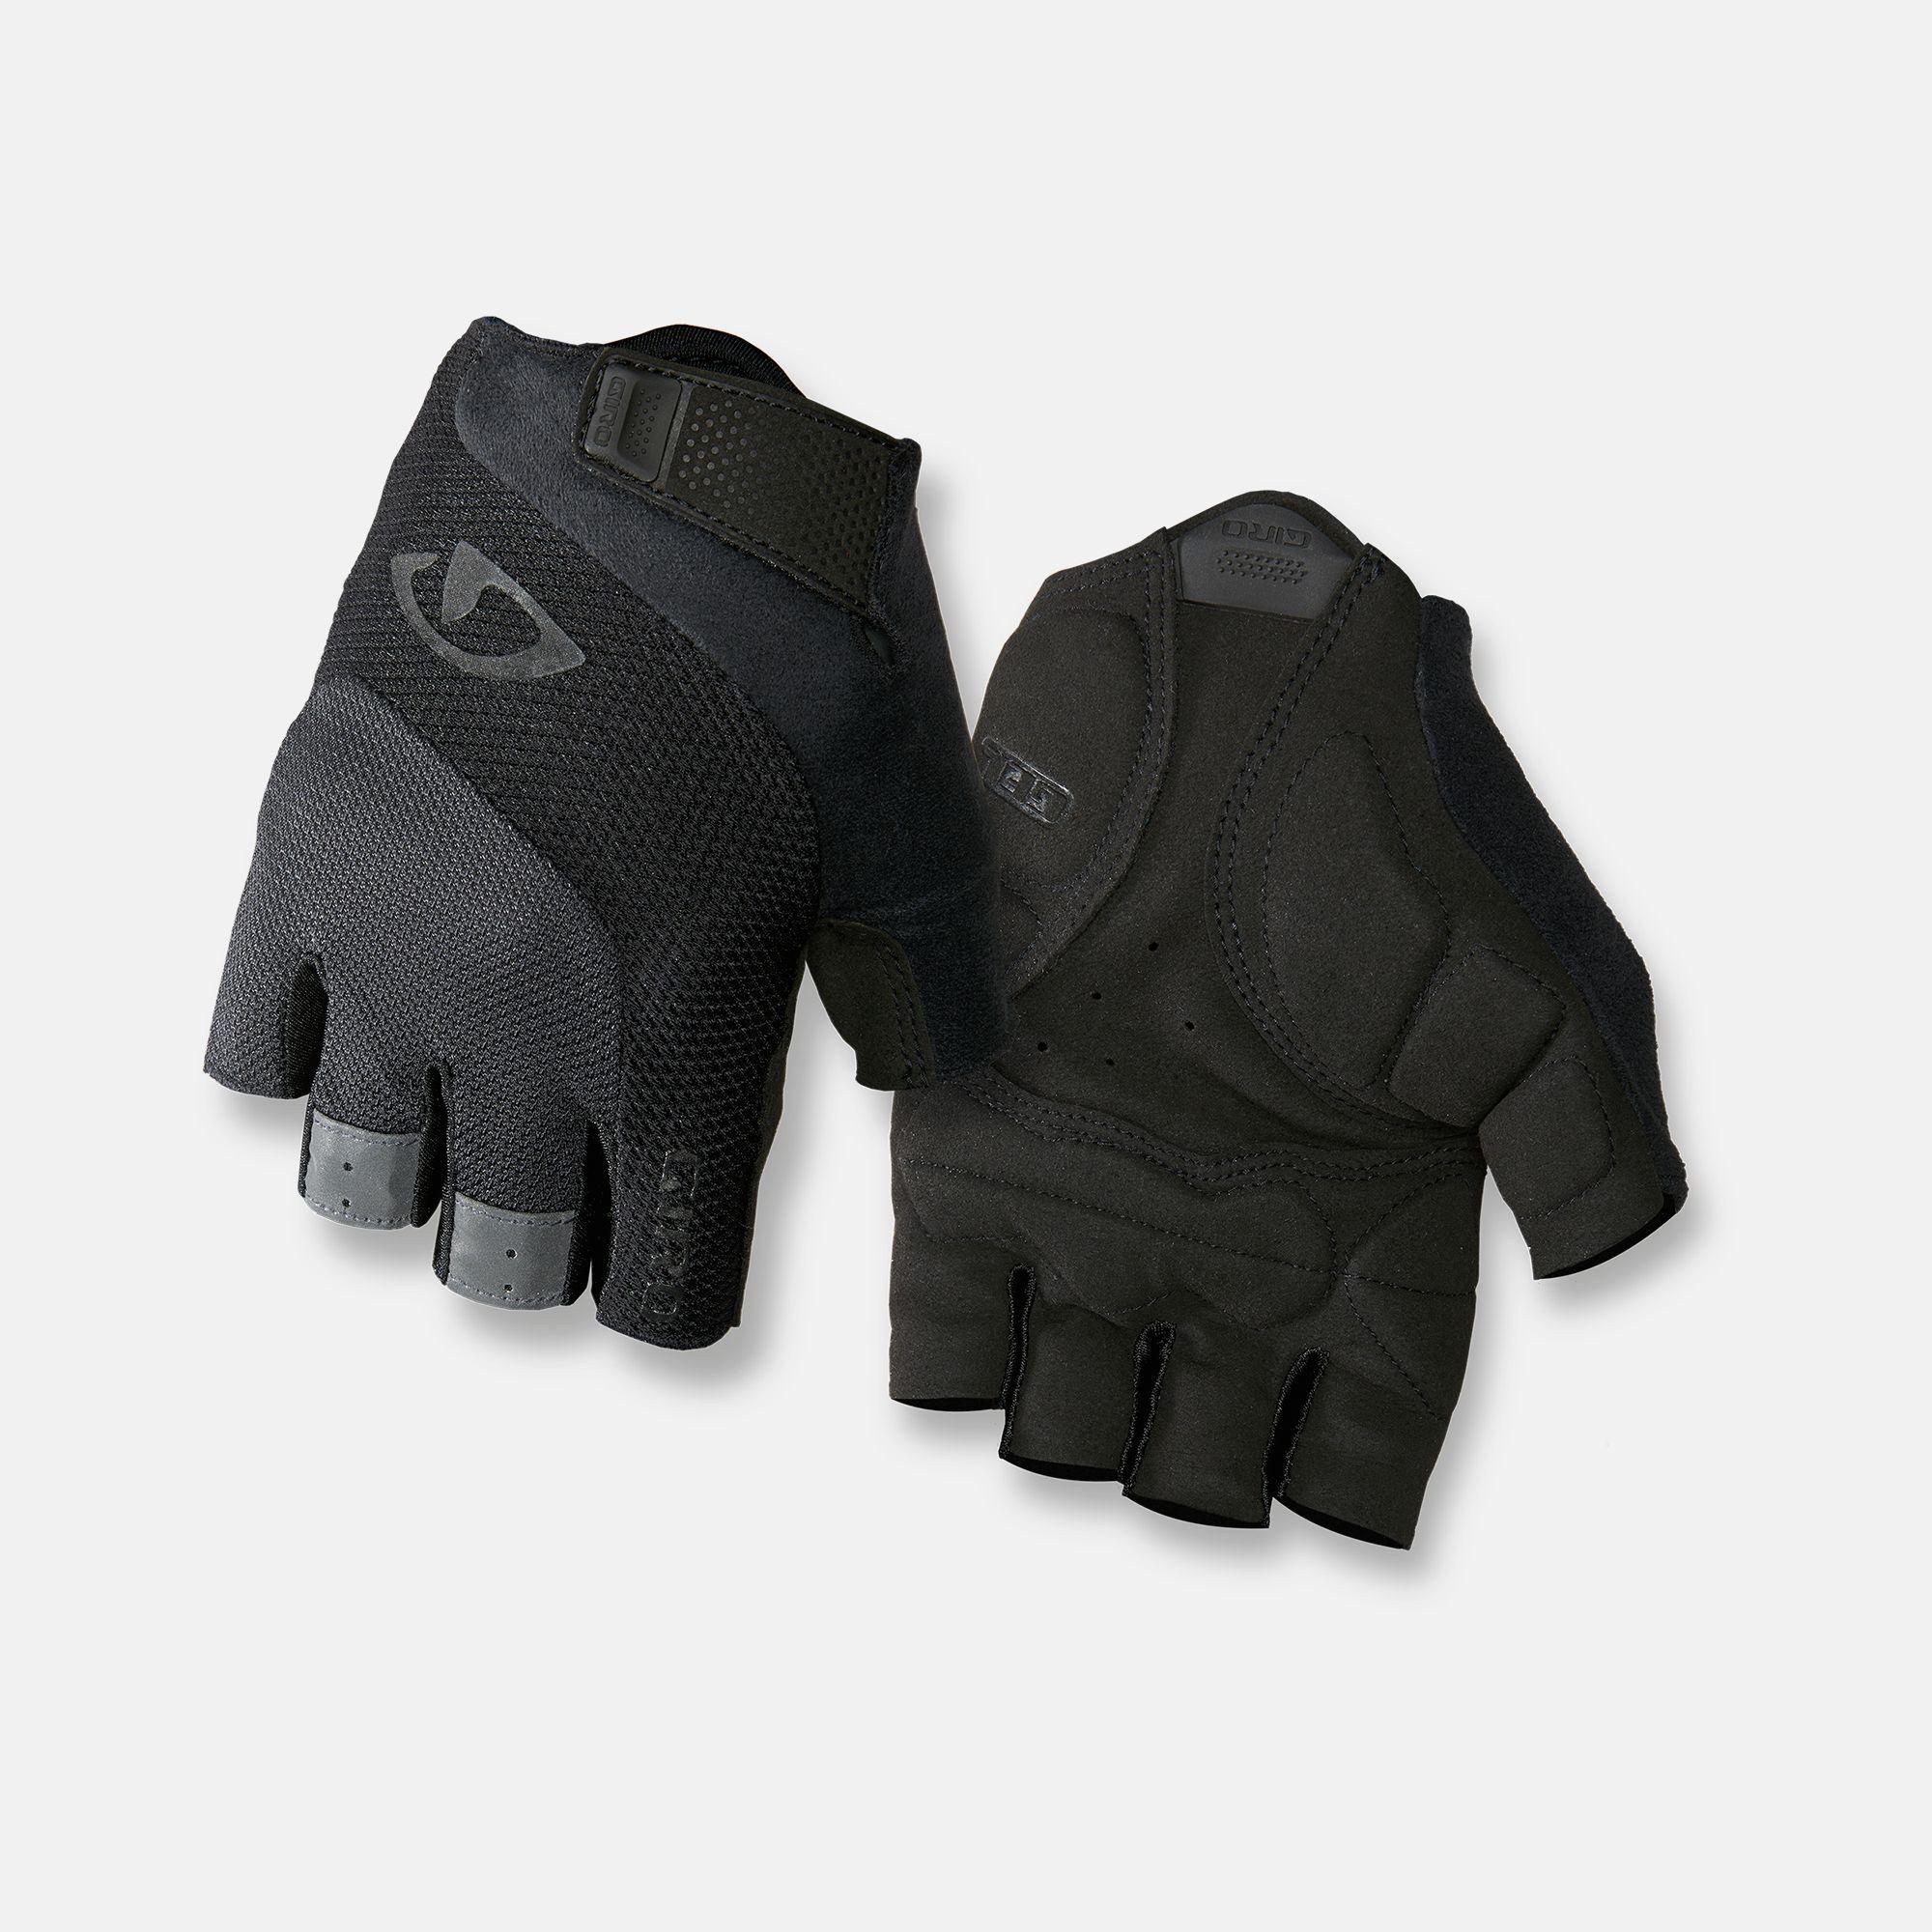 Giro Bravo Gel Cycling Gloves White Black